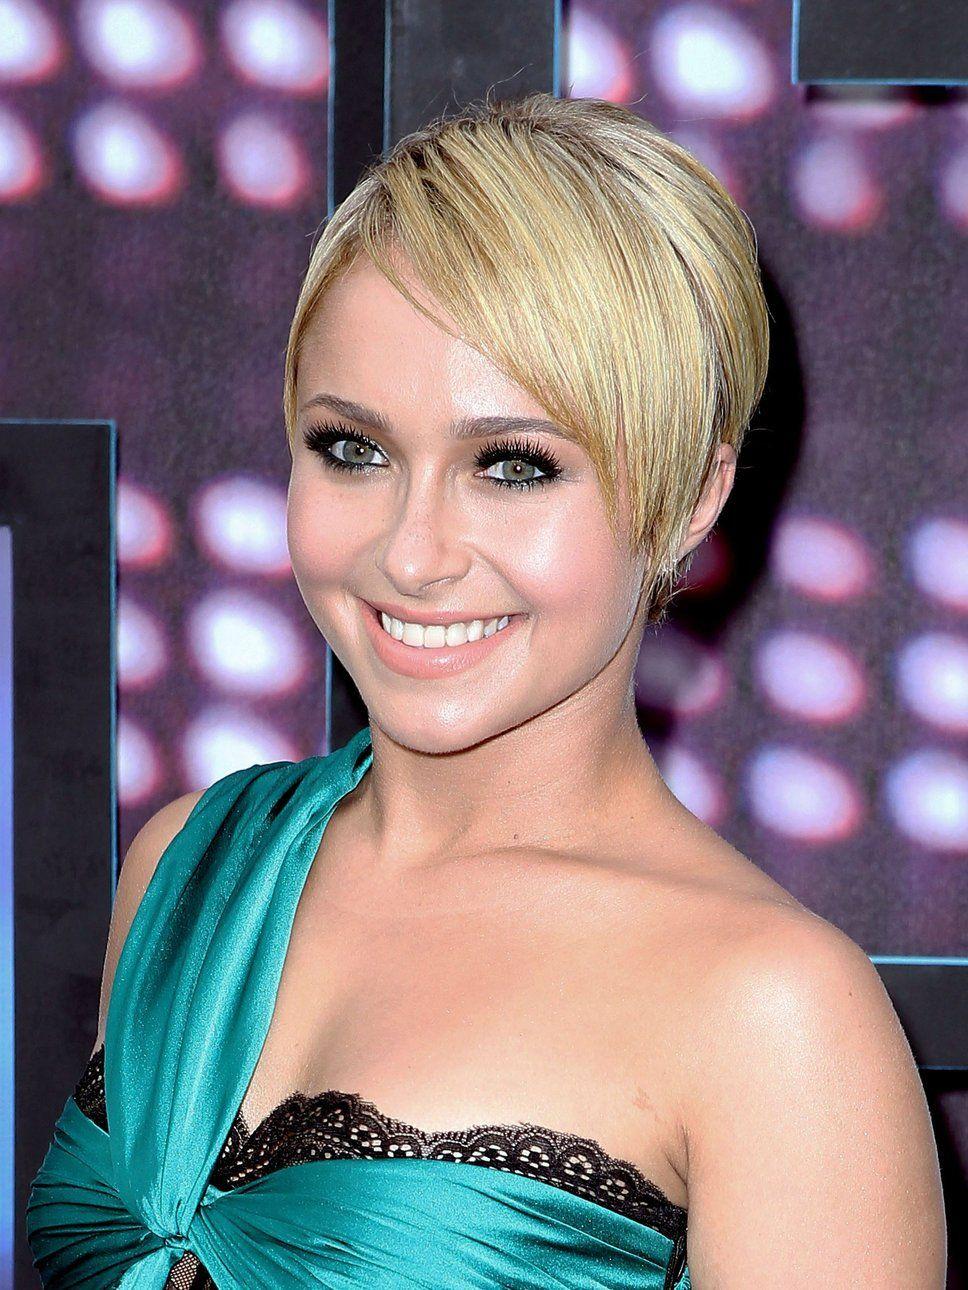 cute hairstyles for short hair you canut miss pixie cut short